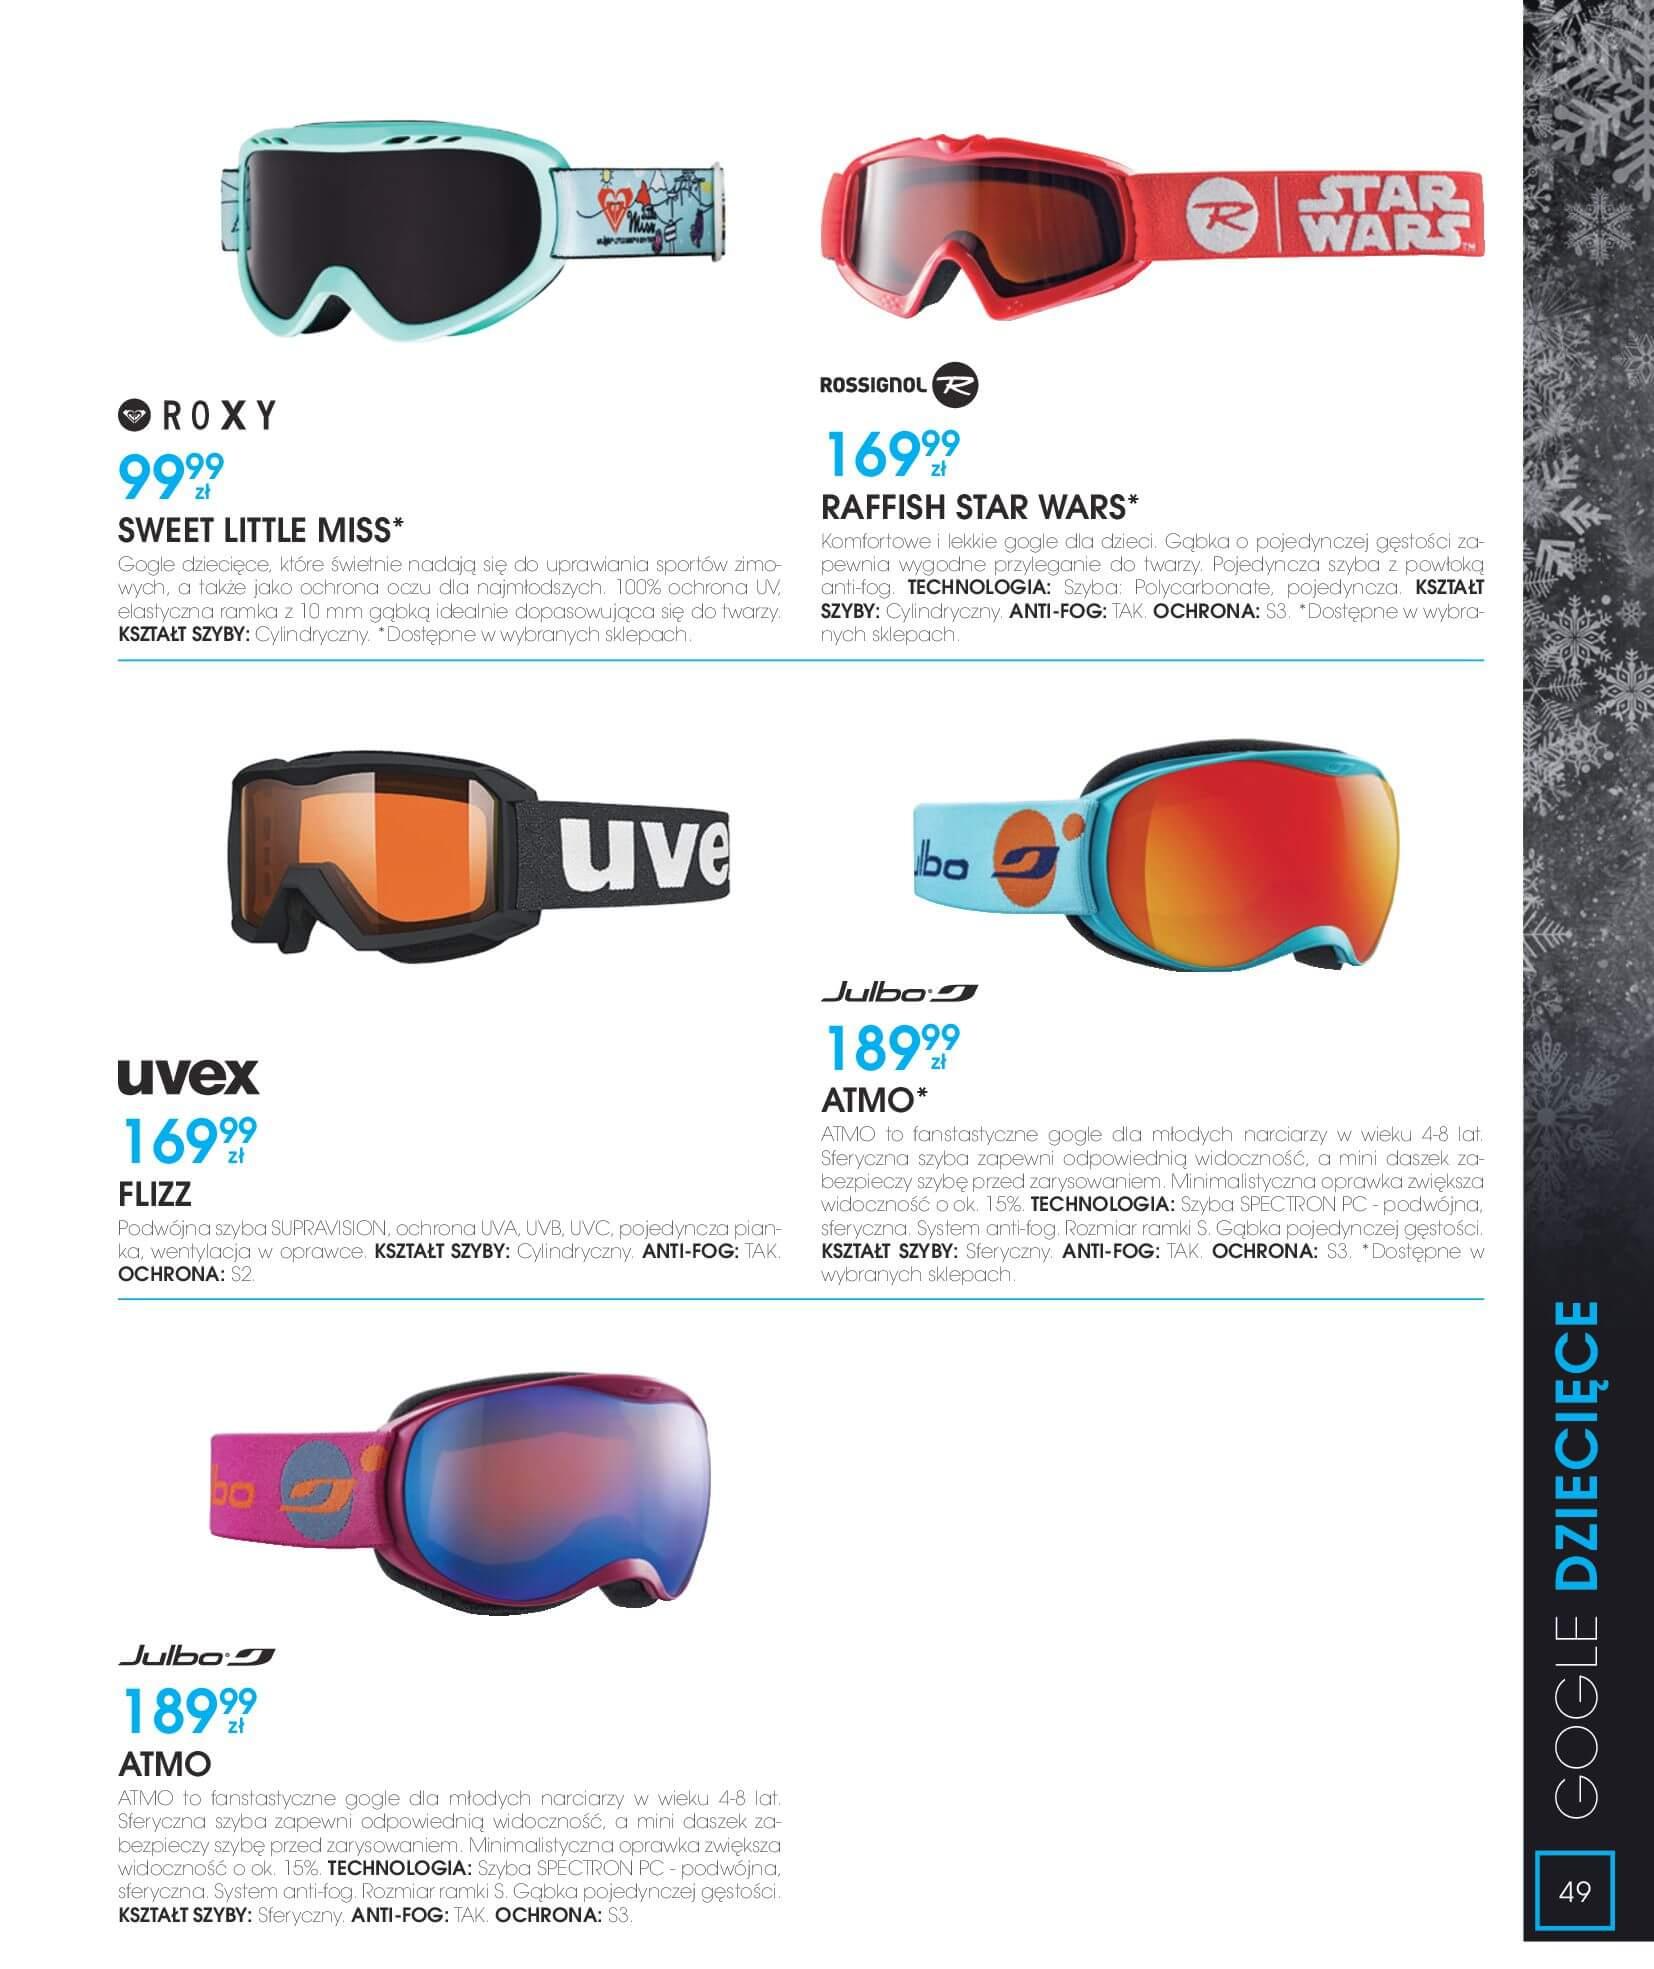 Gazetka Go Sport - Katalog Zima 2017/2018-12.11.2017-28.02.2018-page-49